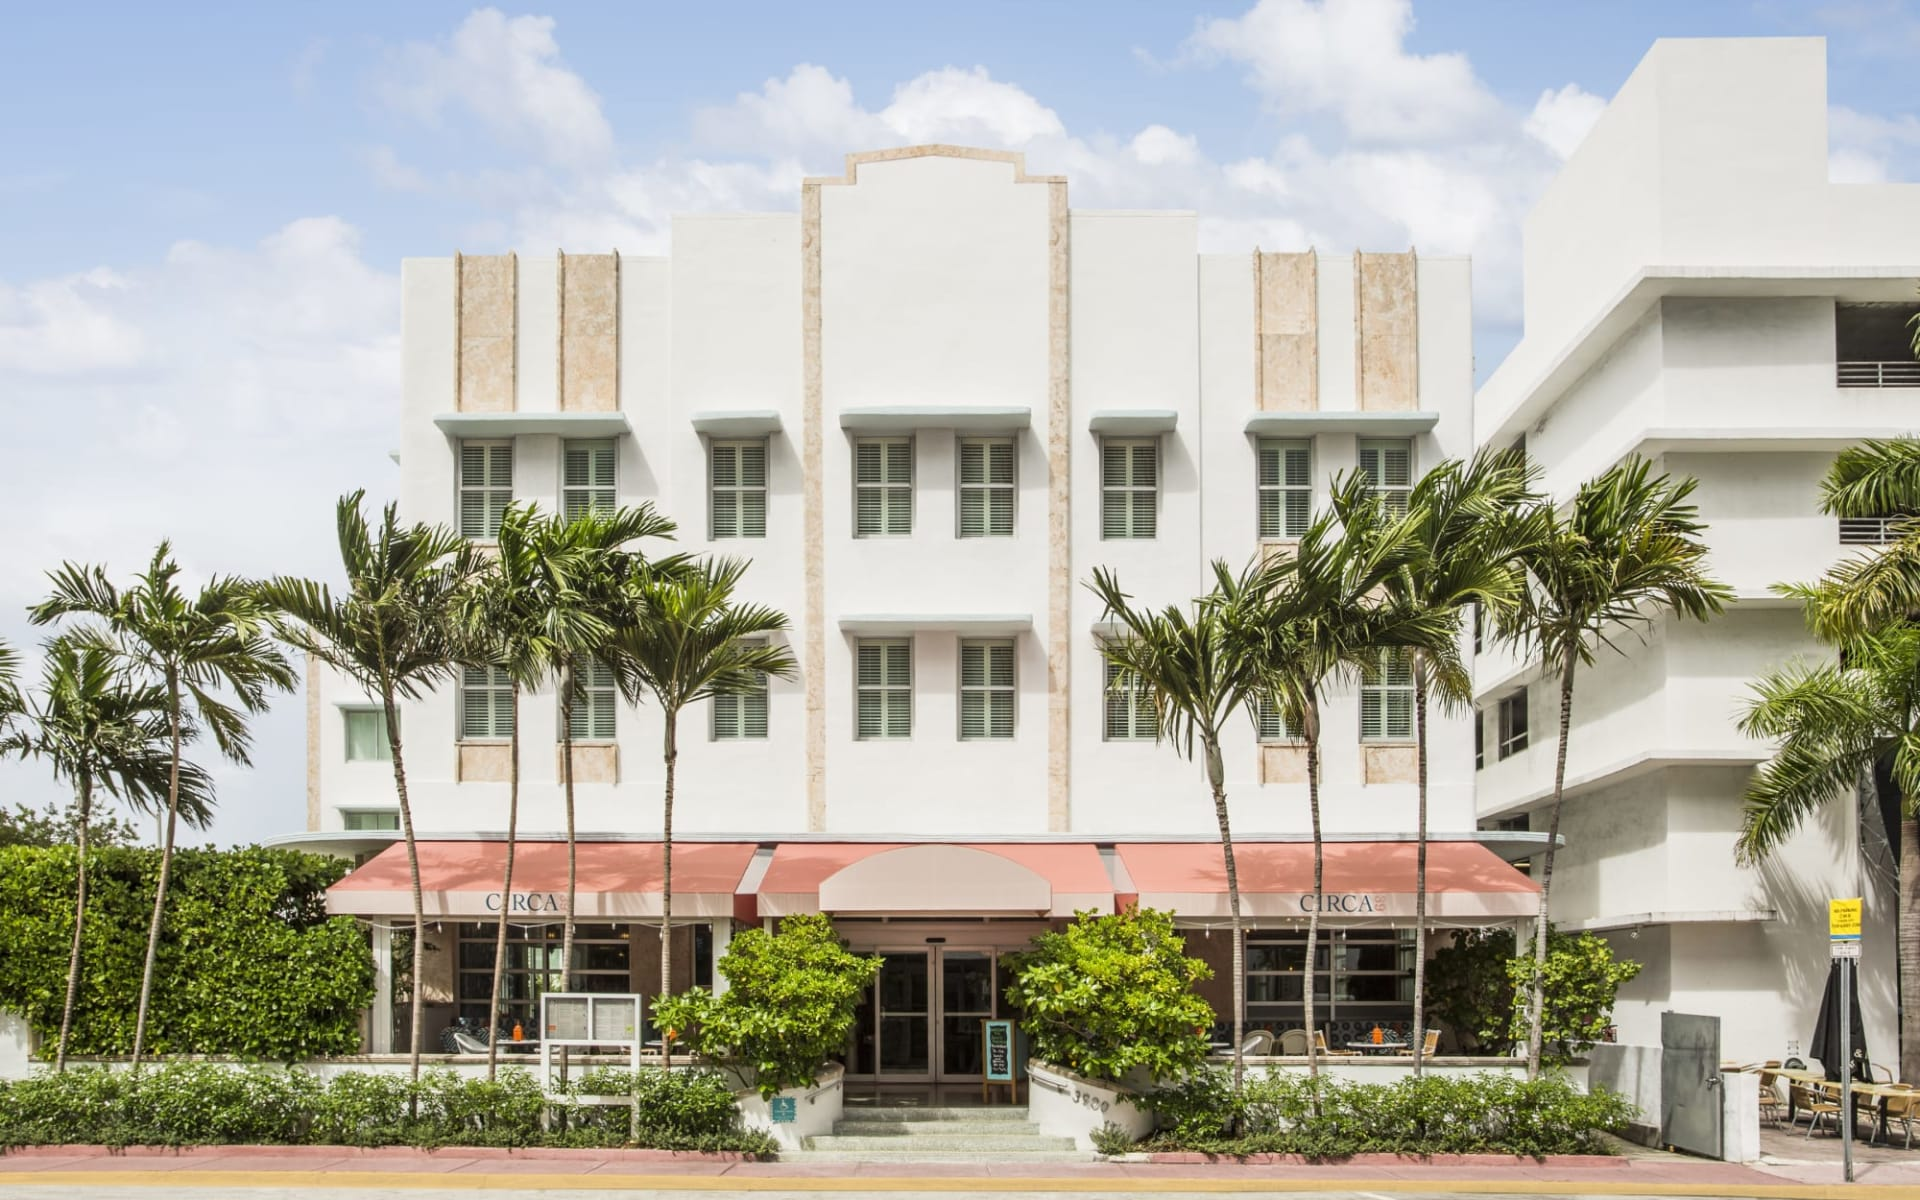 Circa 39 Hotel in Miami Beach:  Circa 39 - Aussenansicht